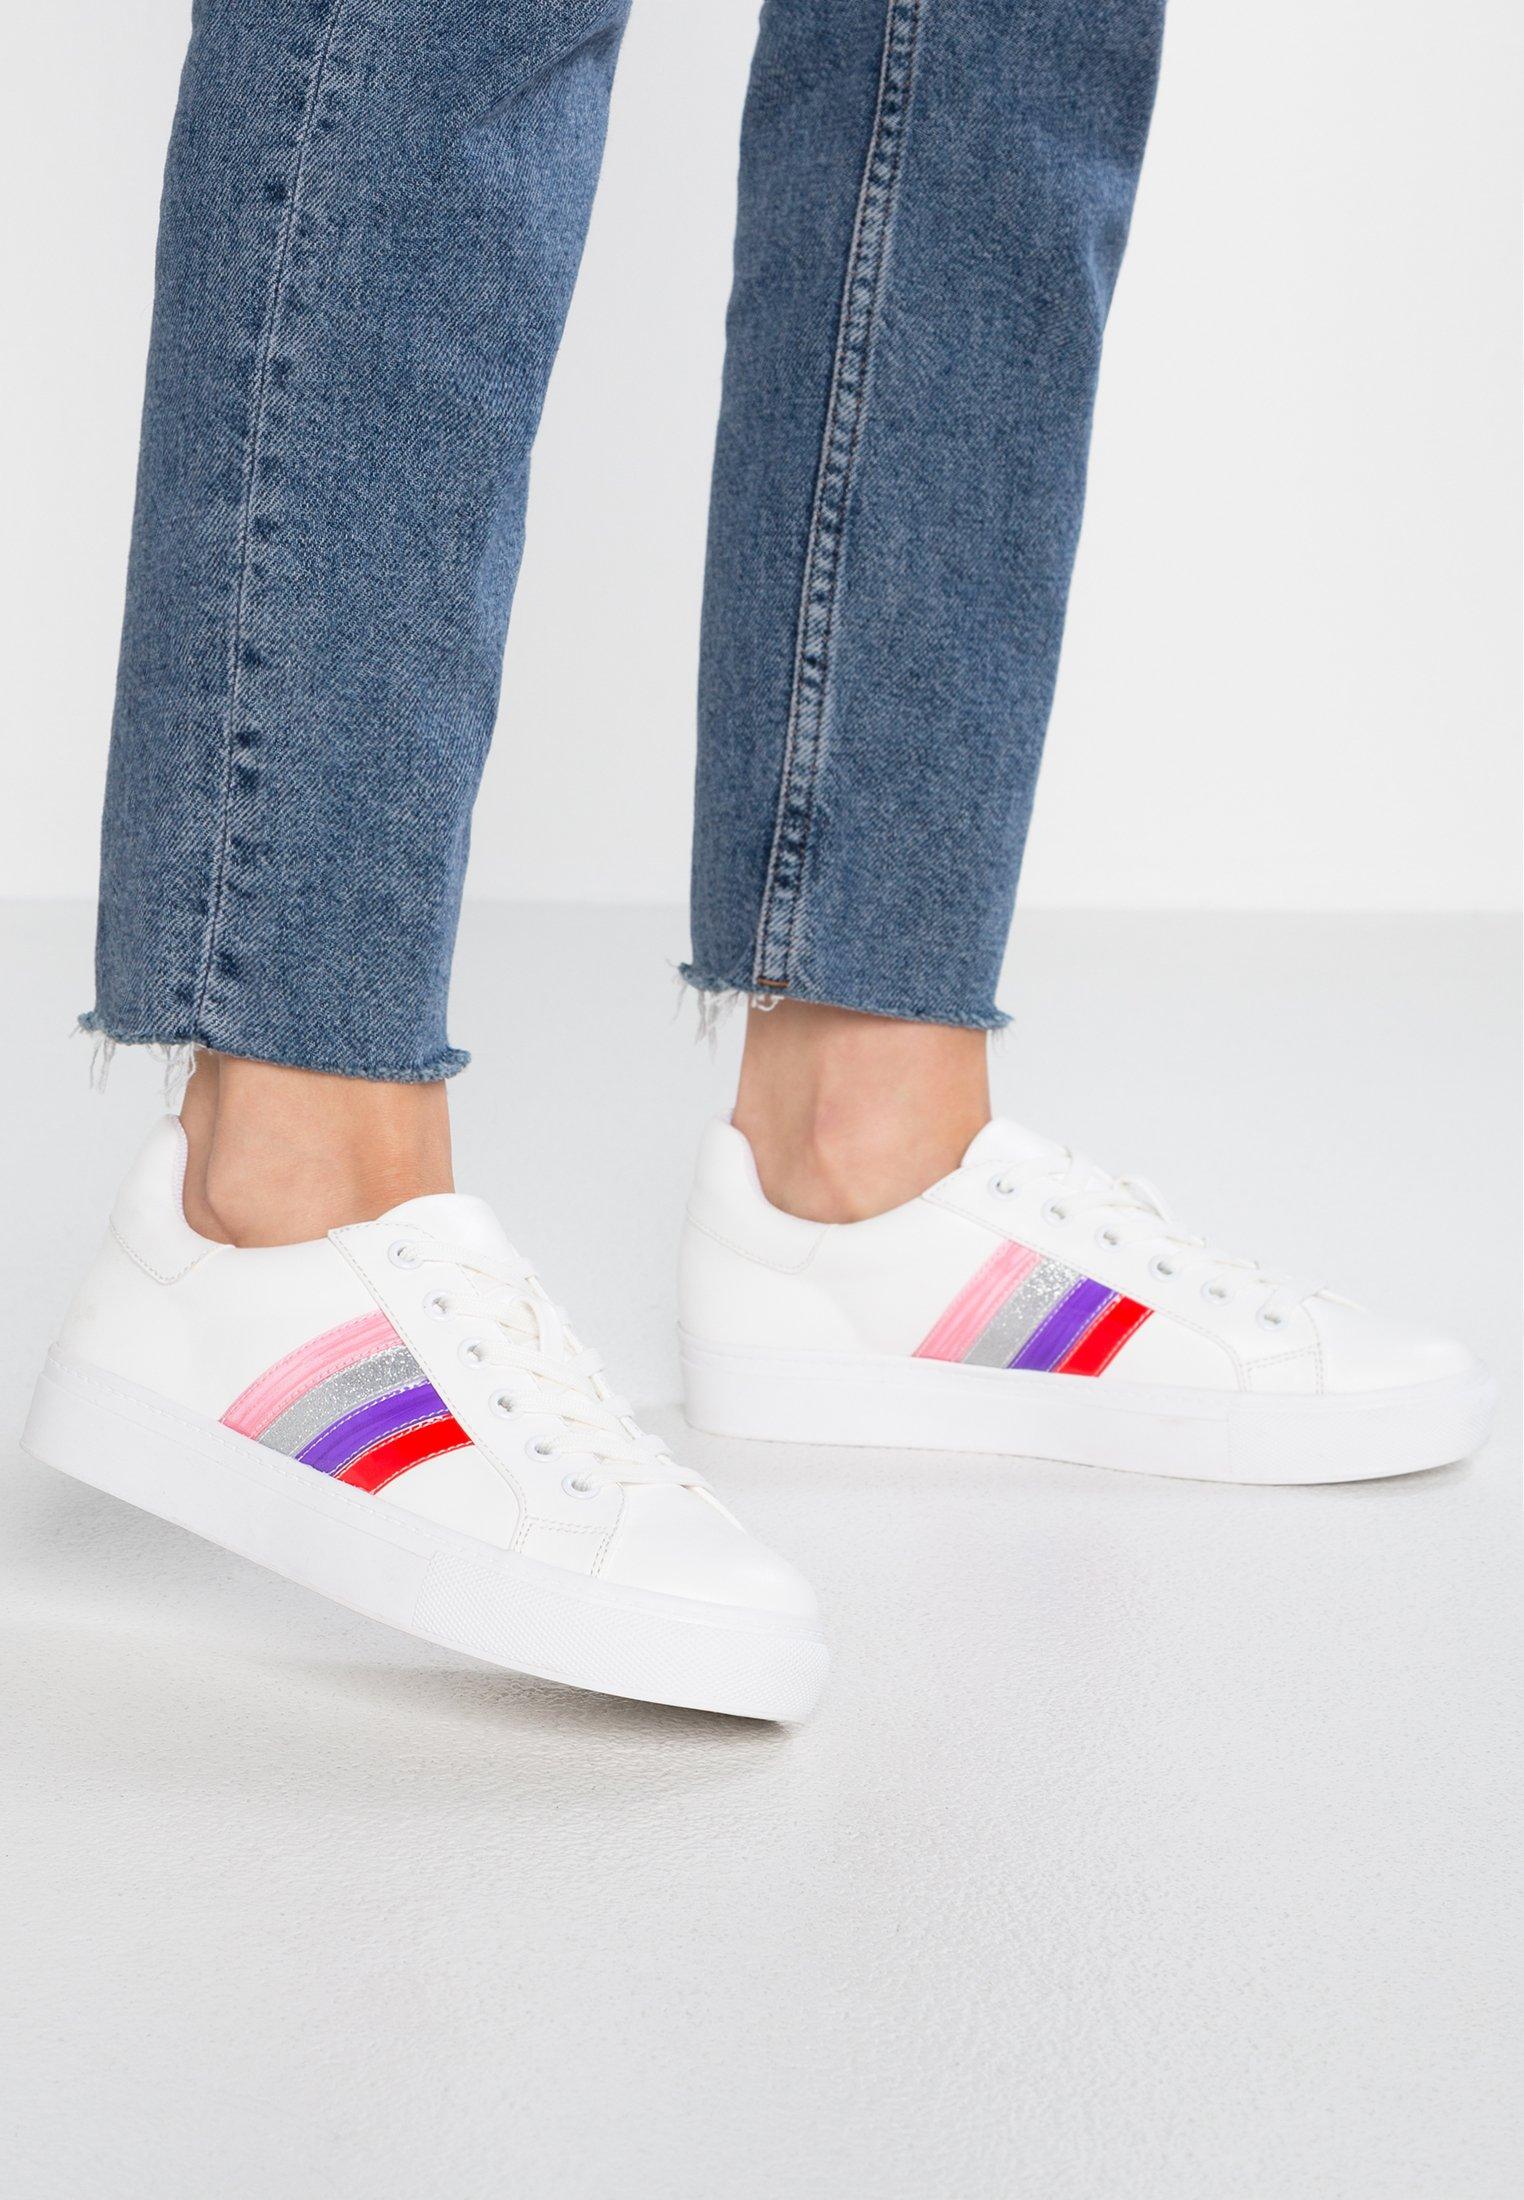 Sneakers White Basse White amp;odd amp;odd Sneakers Even Even Basse OPwn0k